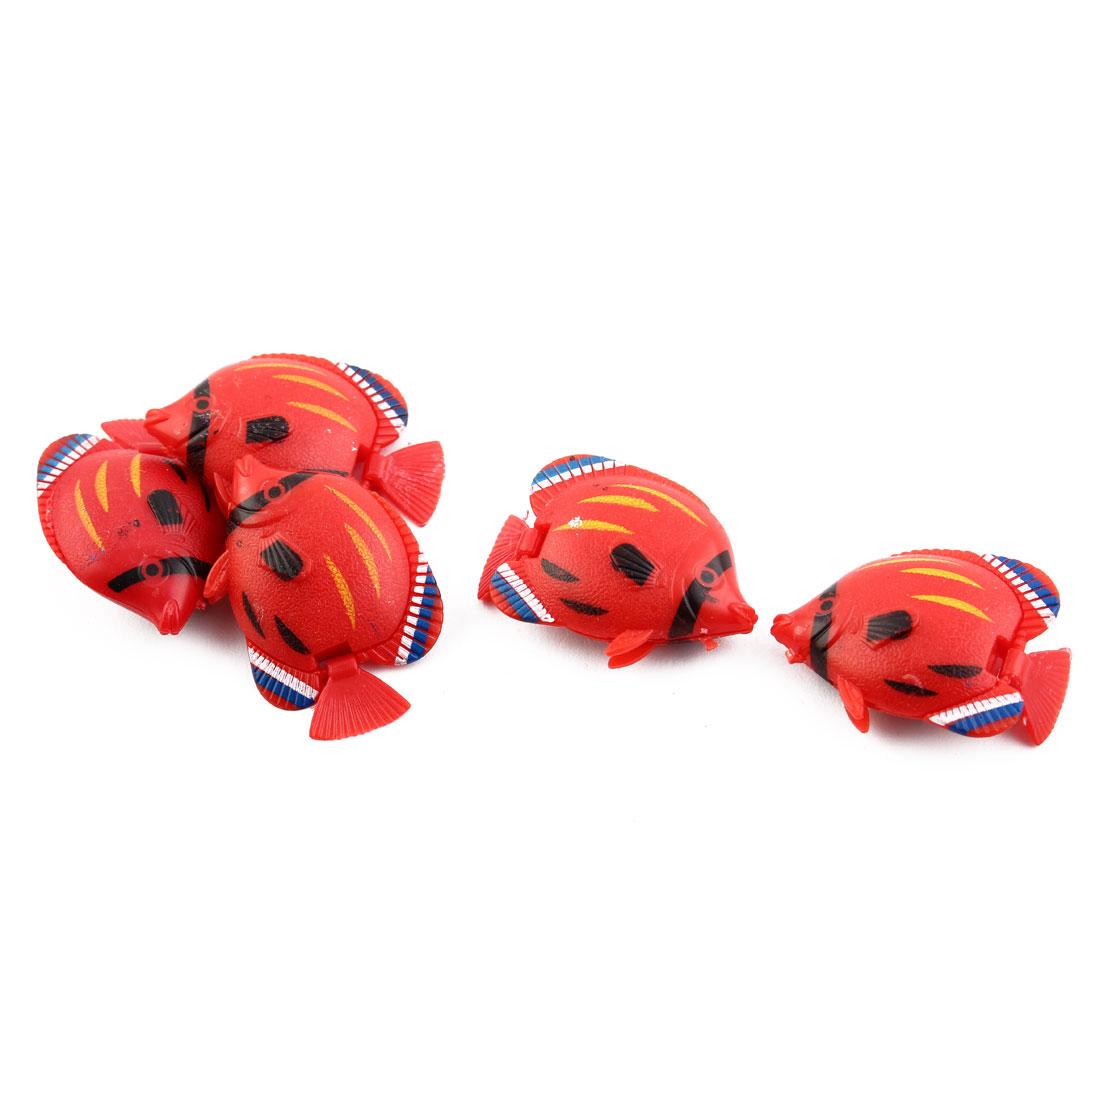 Aquarium Vividly Floating Mini Plastic Fish Wiggled Ornament Red 5pcs